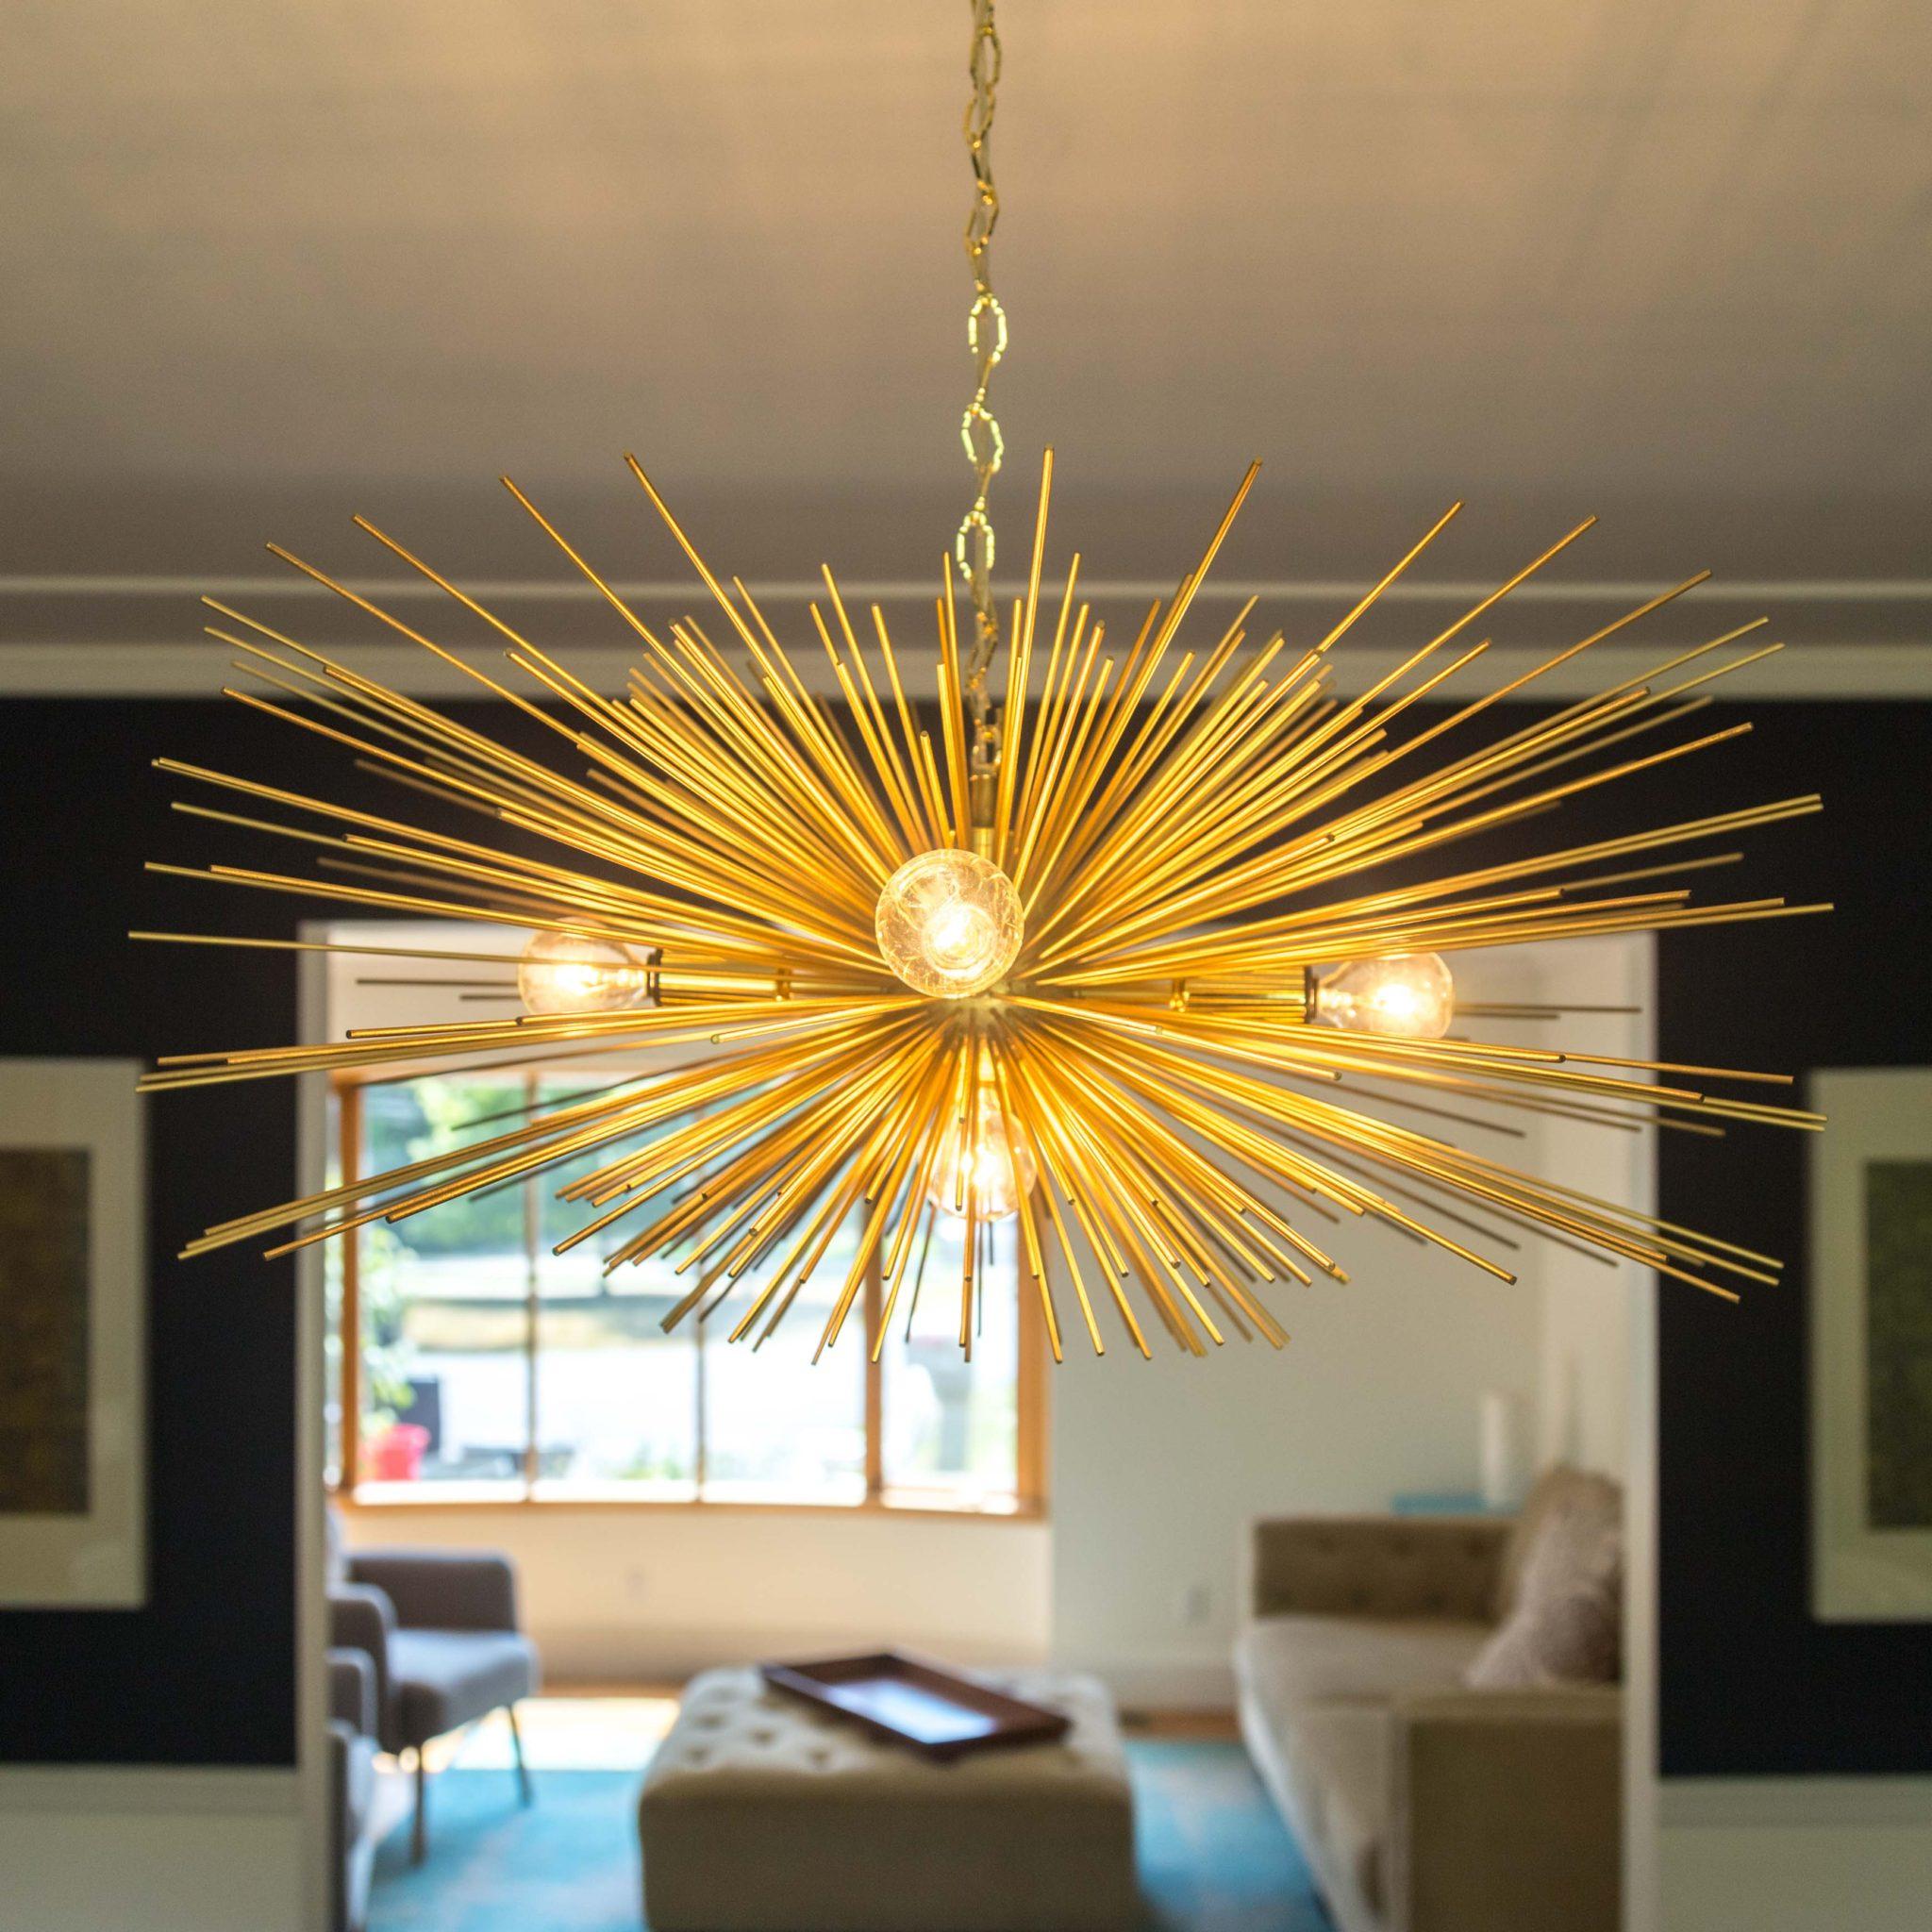 our new dining room on allweareblog.com | dining room light | gold light | brass light | chandelier